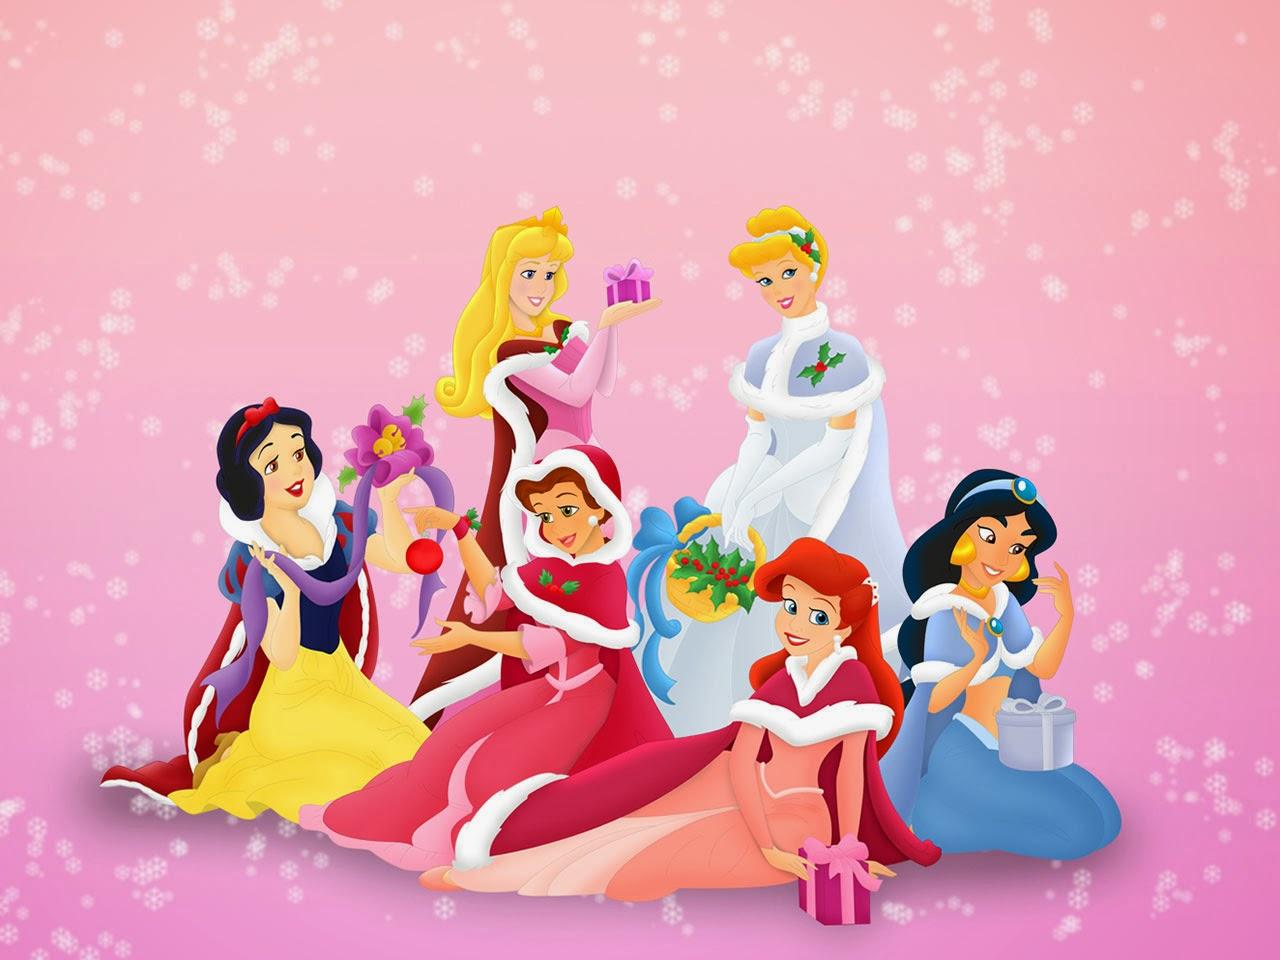 HD Wallpapers 4u Download Disney Princess HD Wallpapers 1280x960